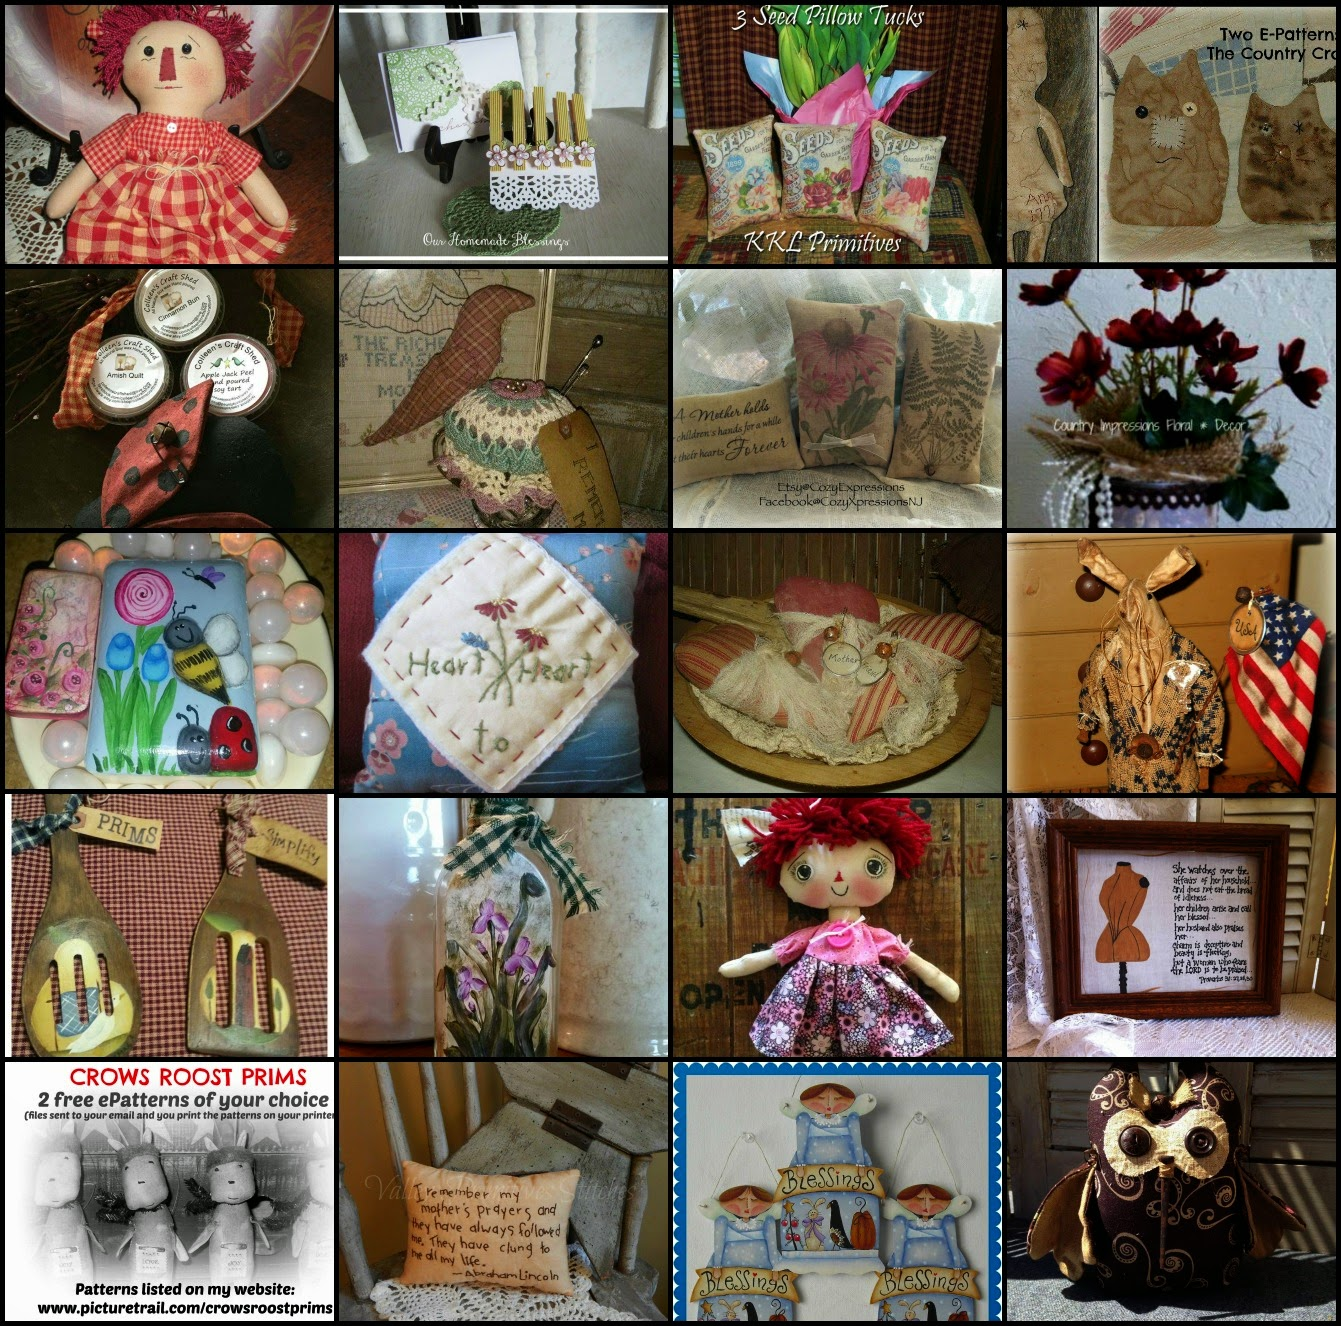 http://3.bp.blogspot.com/-AgodLN_oqe8/VUITR-4FUjI/AAAAAAAAUYs/iUvnjDPzzGI/s1600/giveaway.jpg